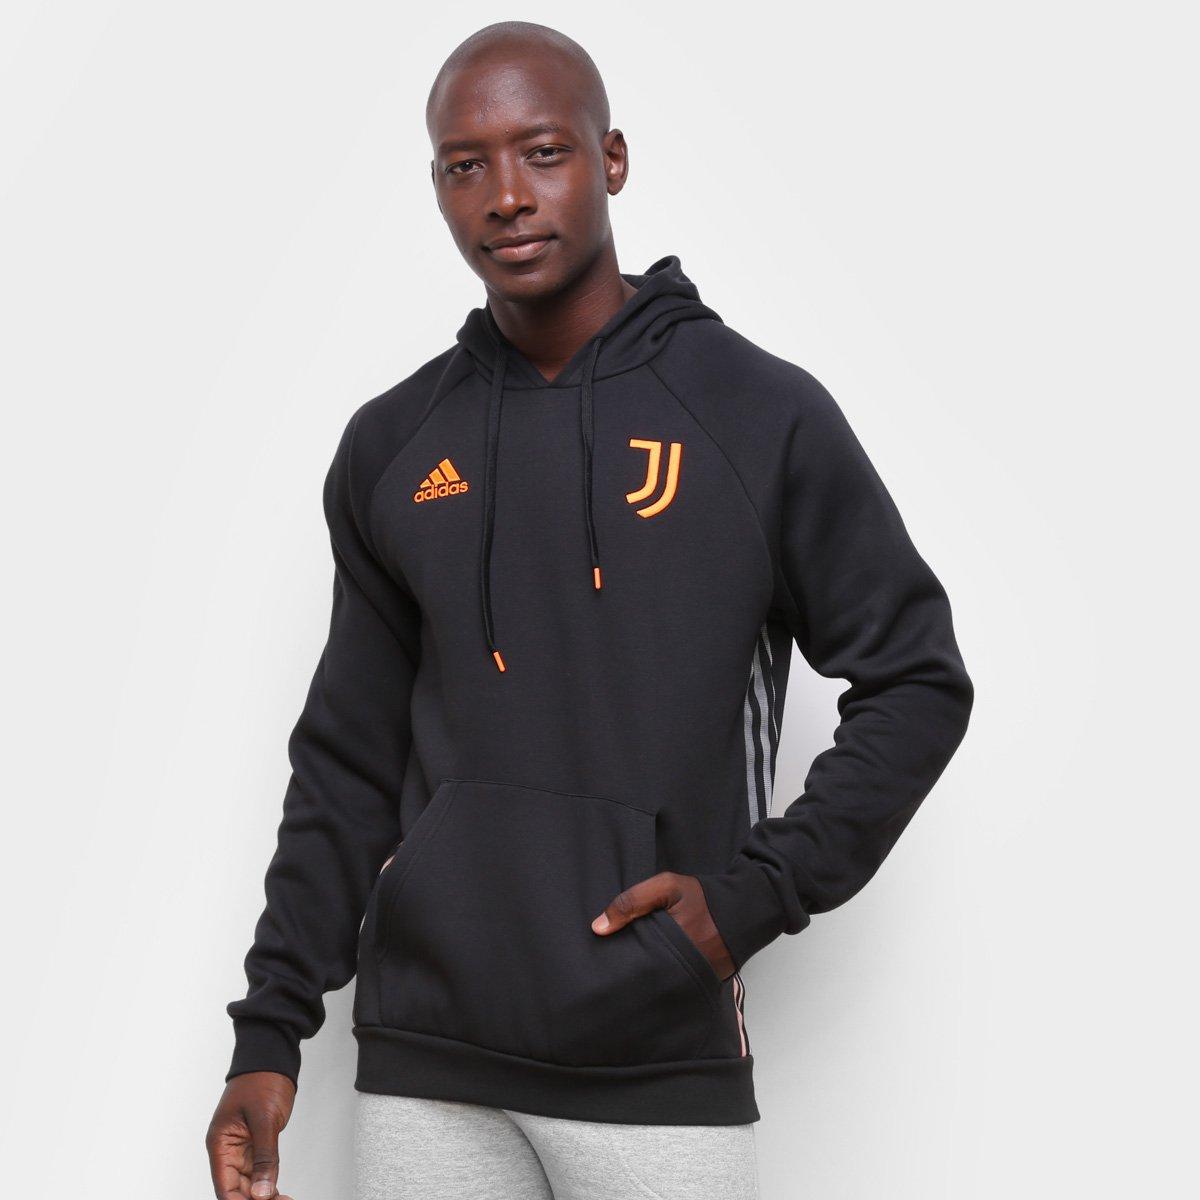 Moletom Juventus Adidas Viagem 21/22 Masculino